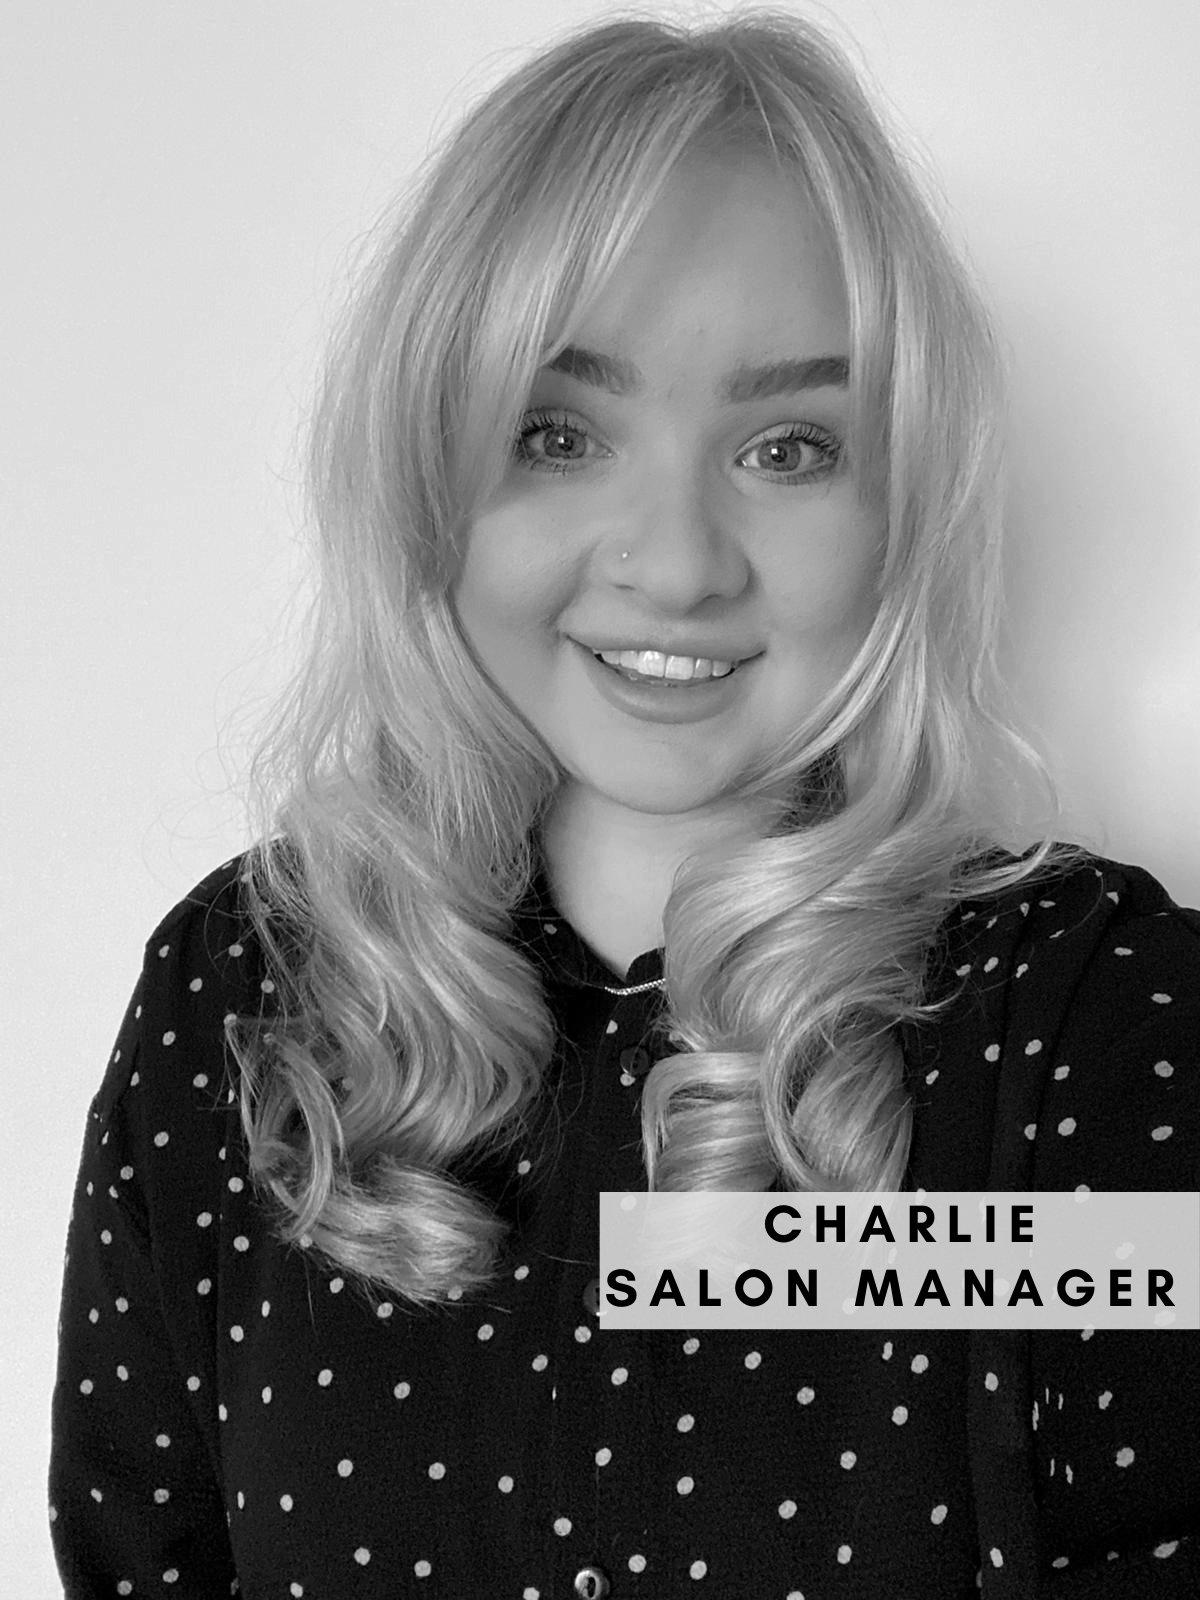 Charlie – Salon Manager